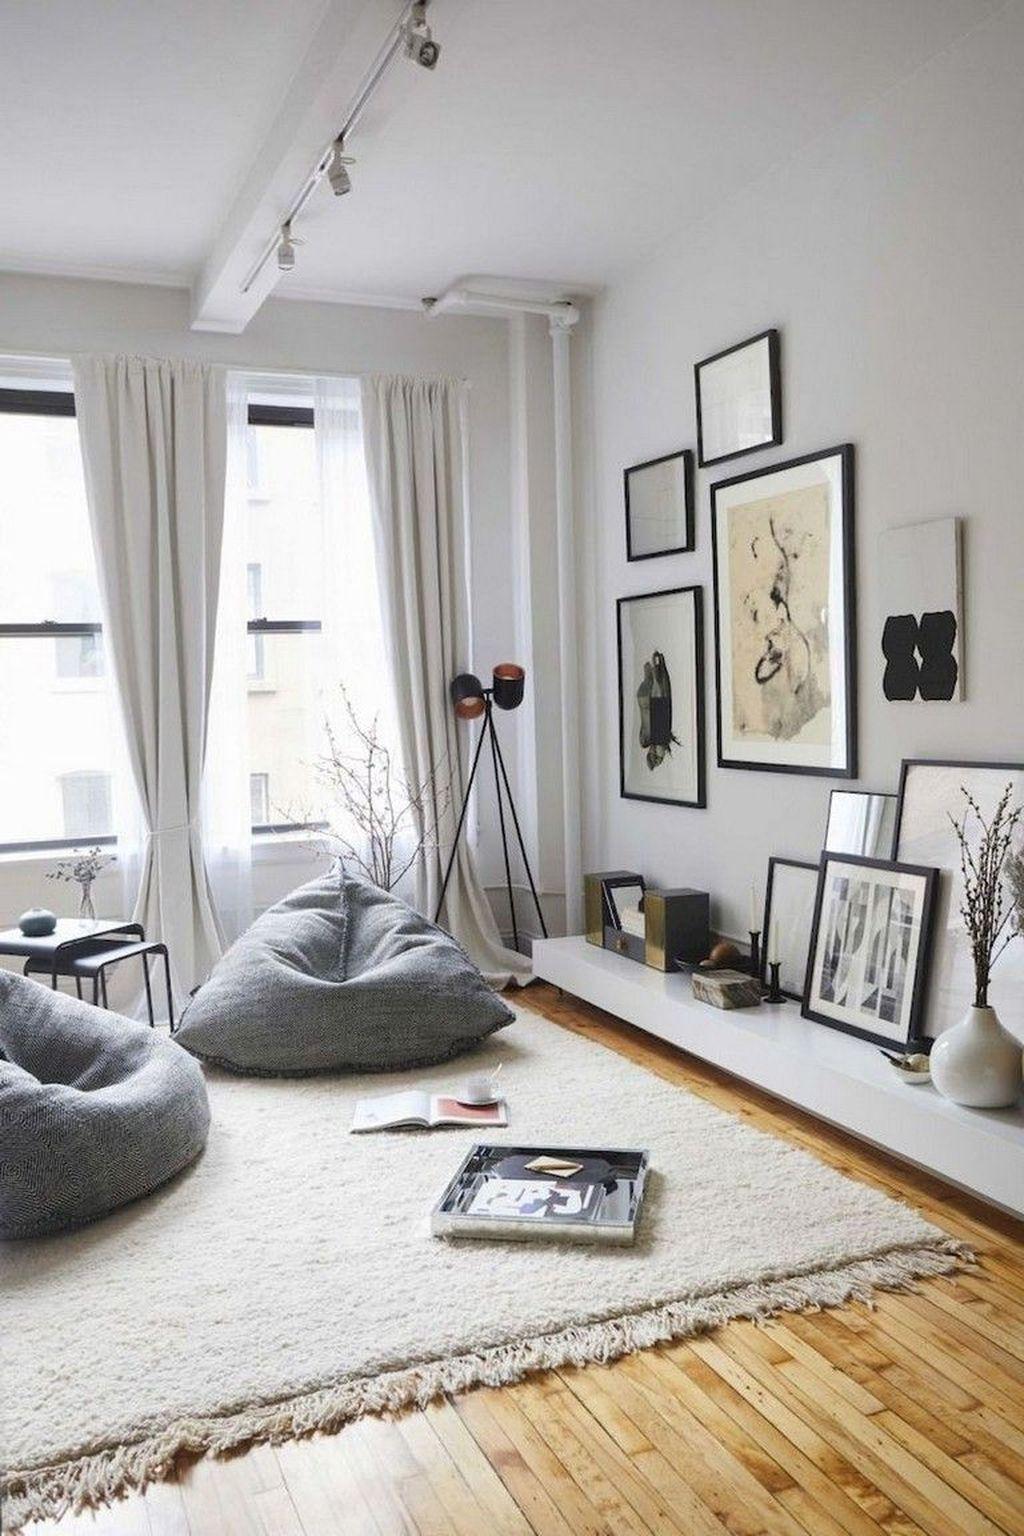 A Comprehensive Overview on Home Decoration in 2020 | Schöne